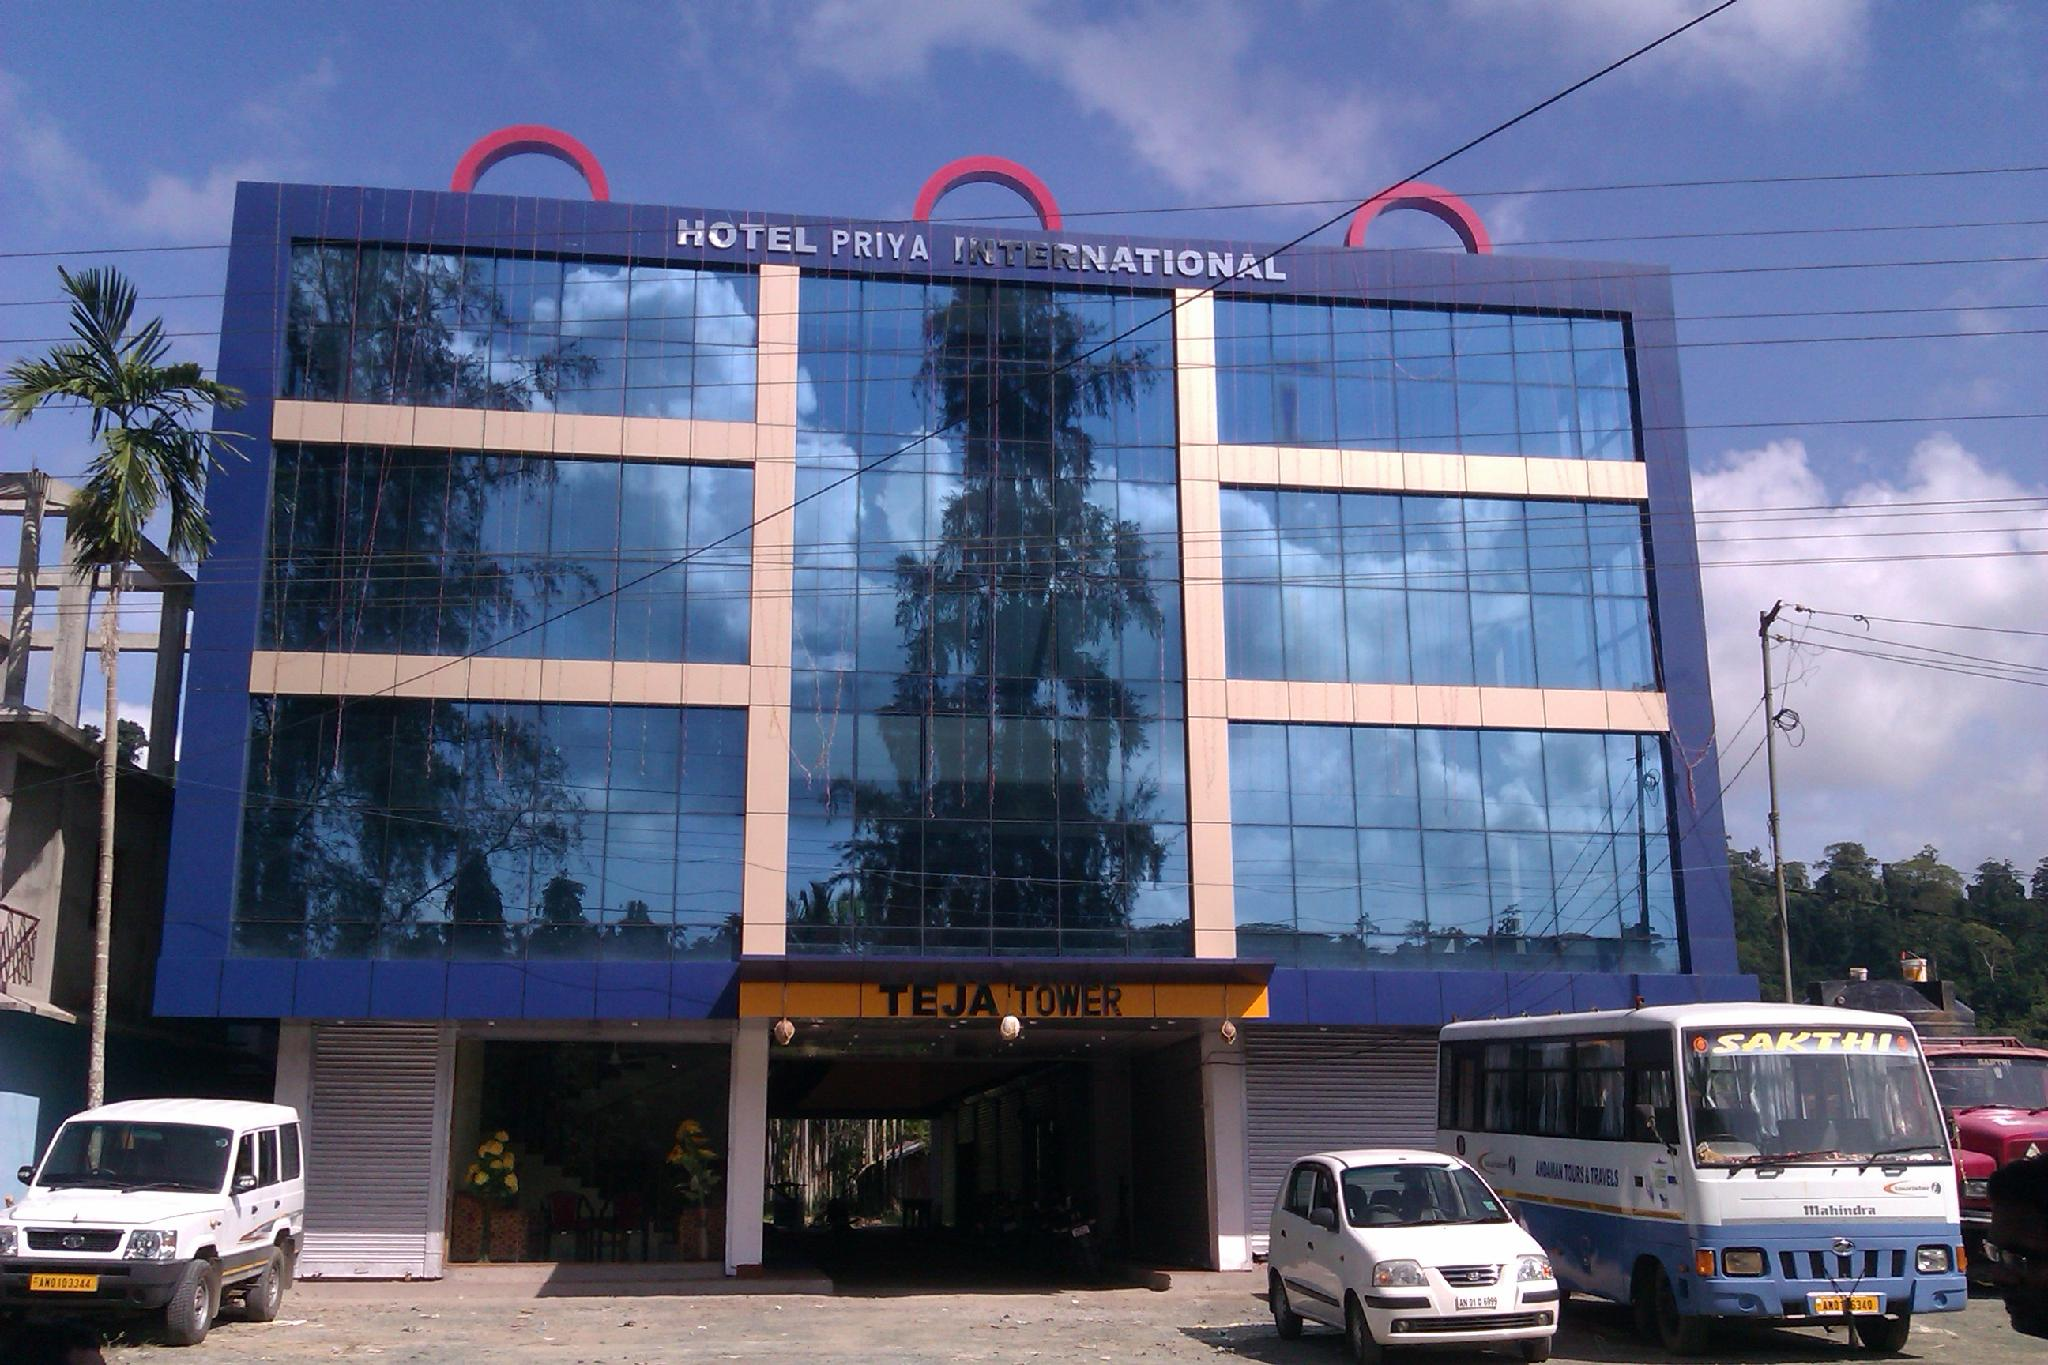 Hotel Priya International Rangat North And Middle Andaman